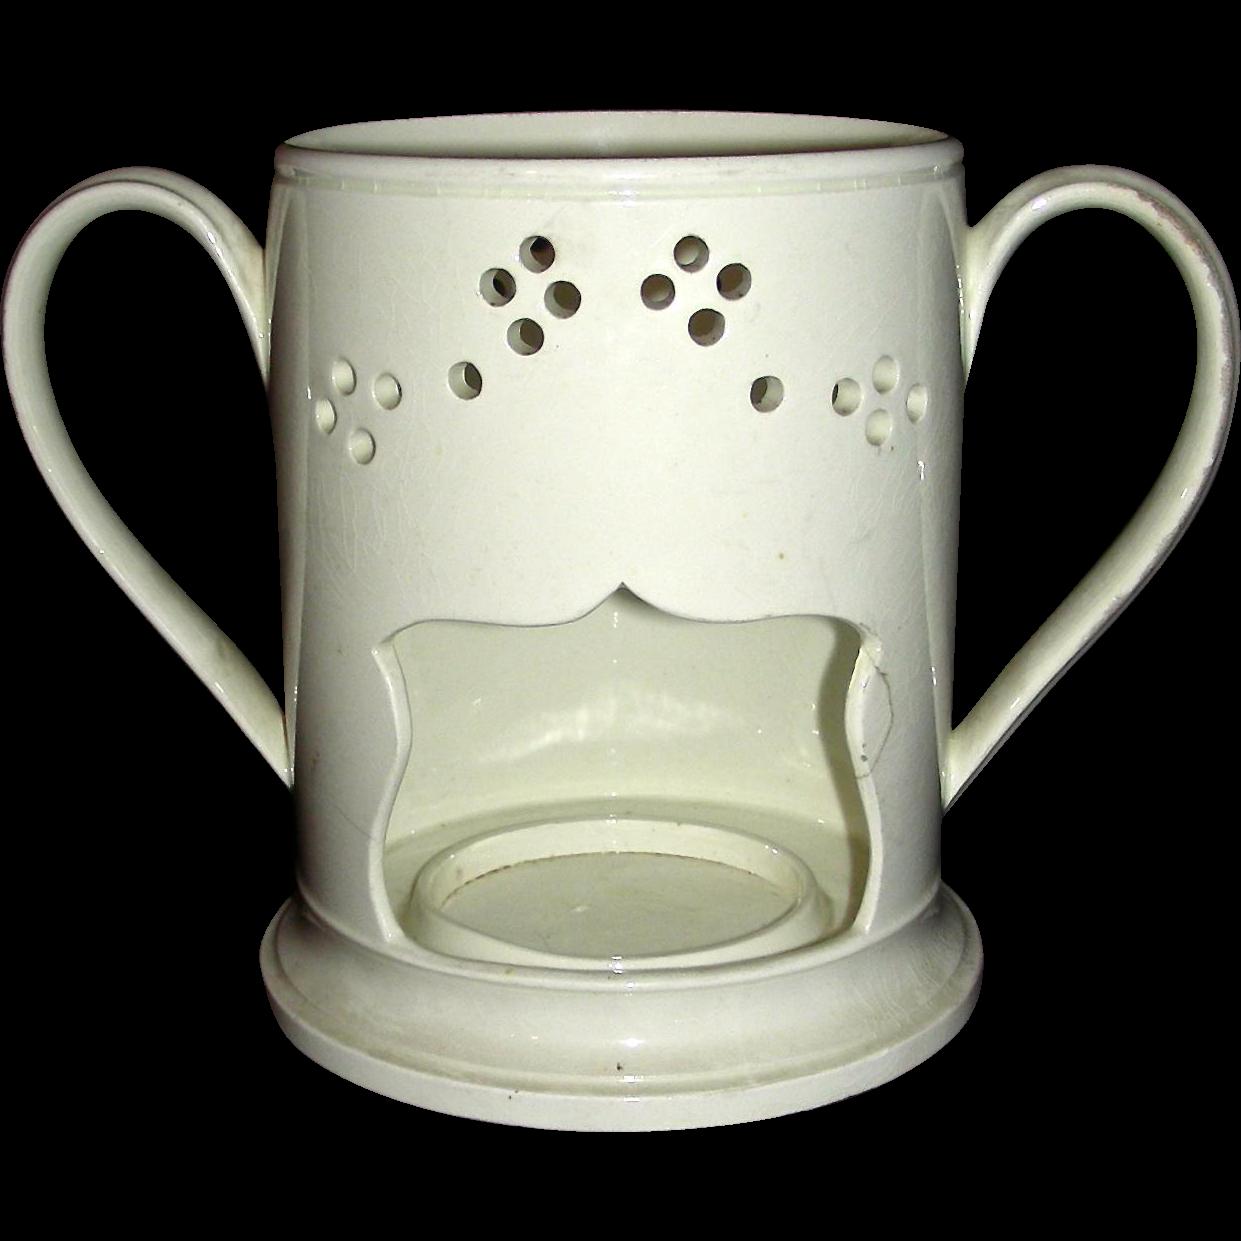 Late 18th Century English Creamware Food Warmer or Veilleuse